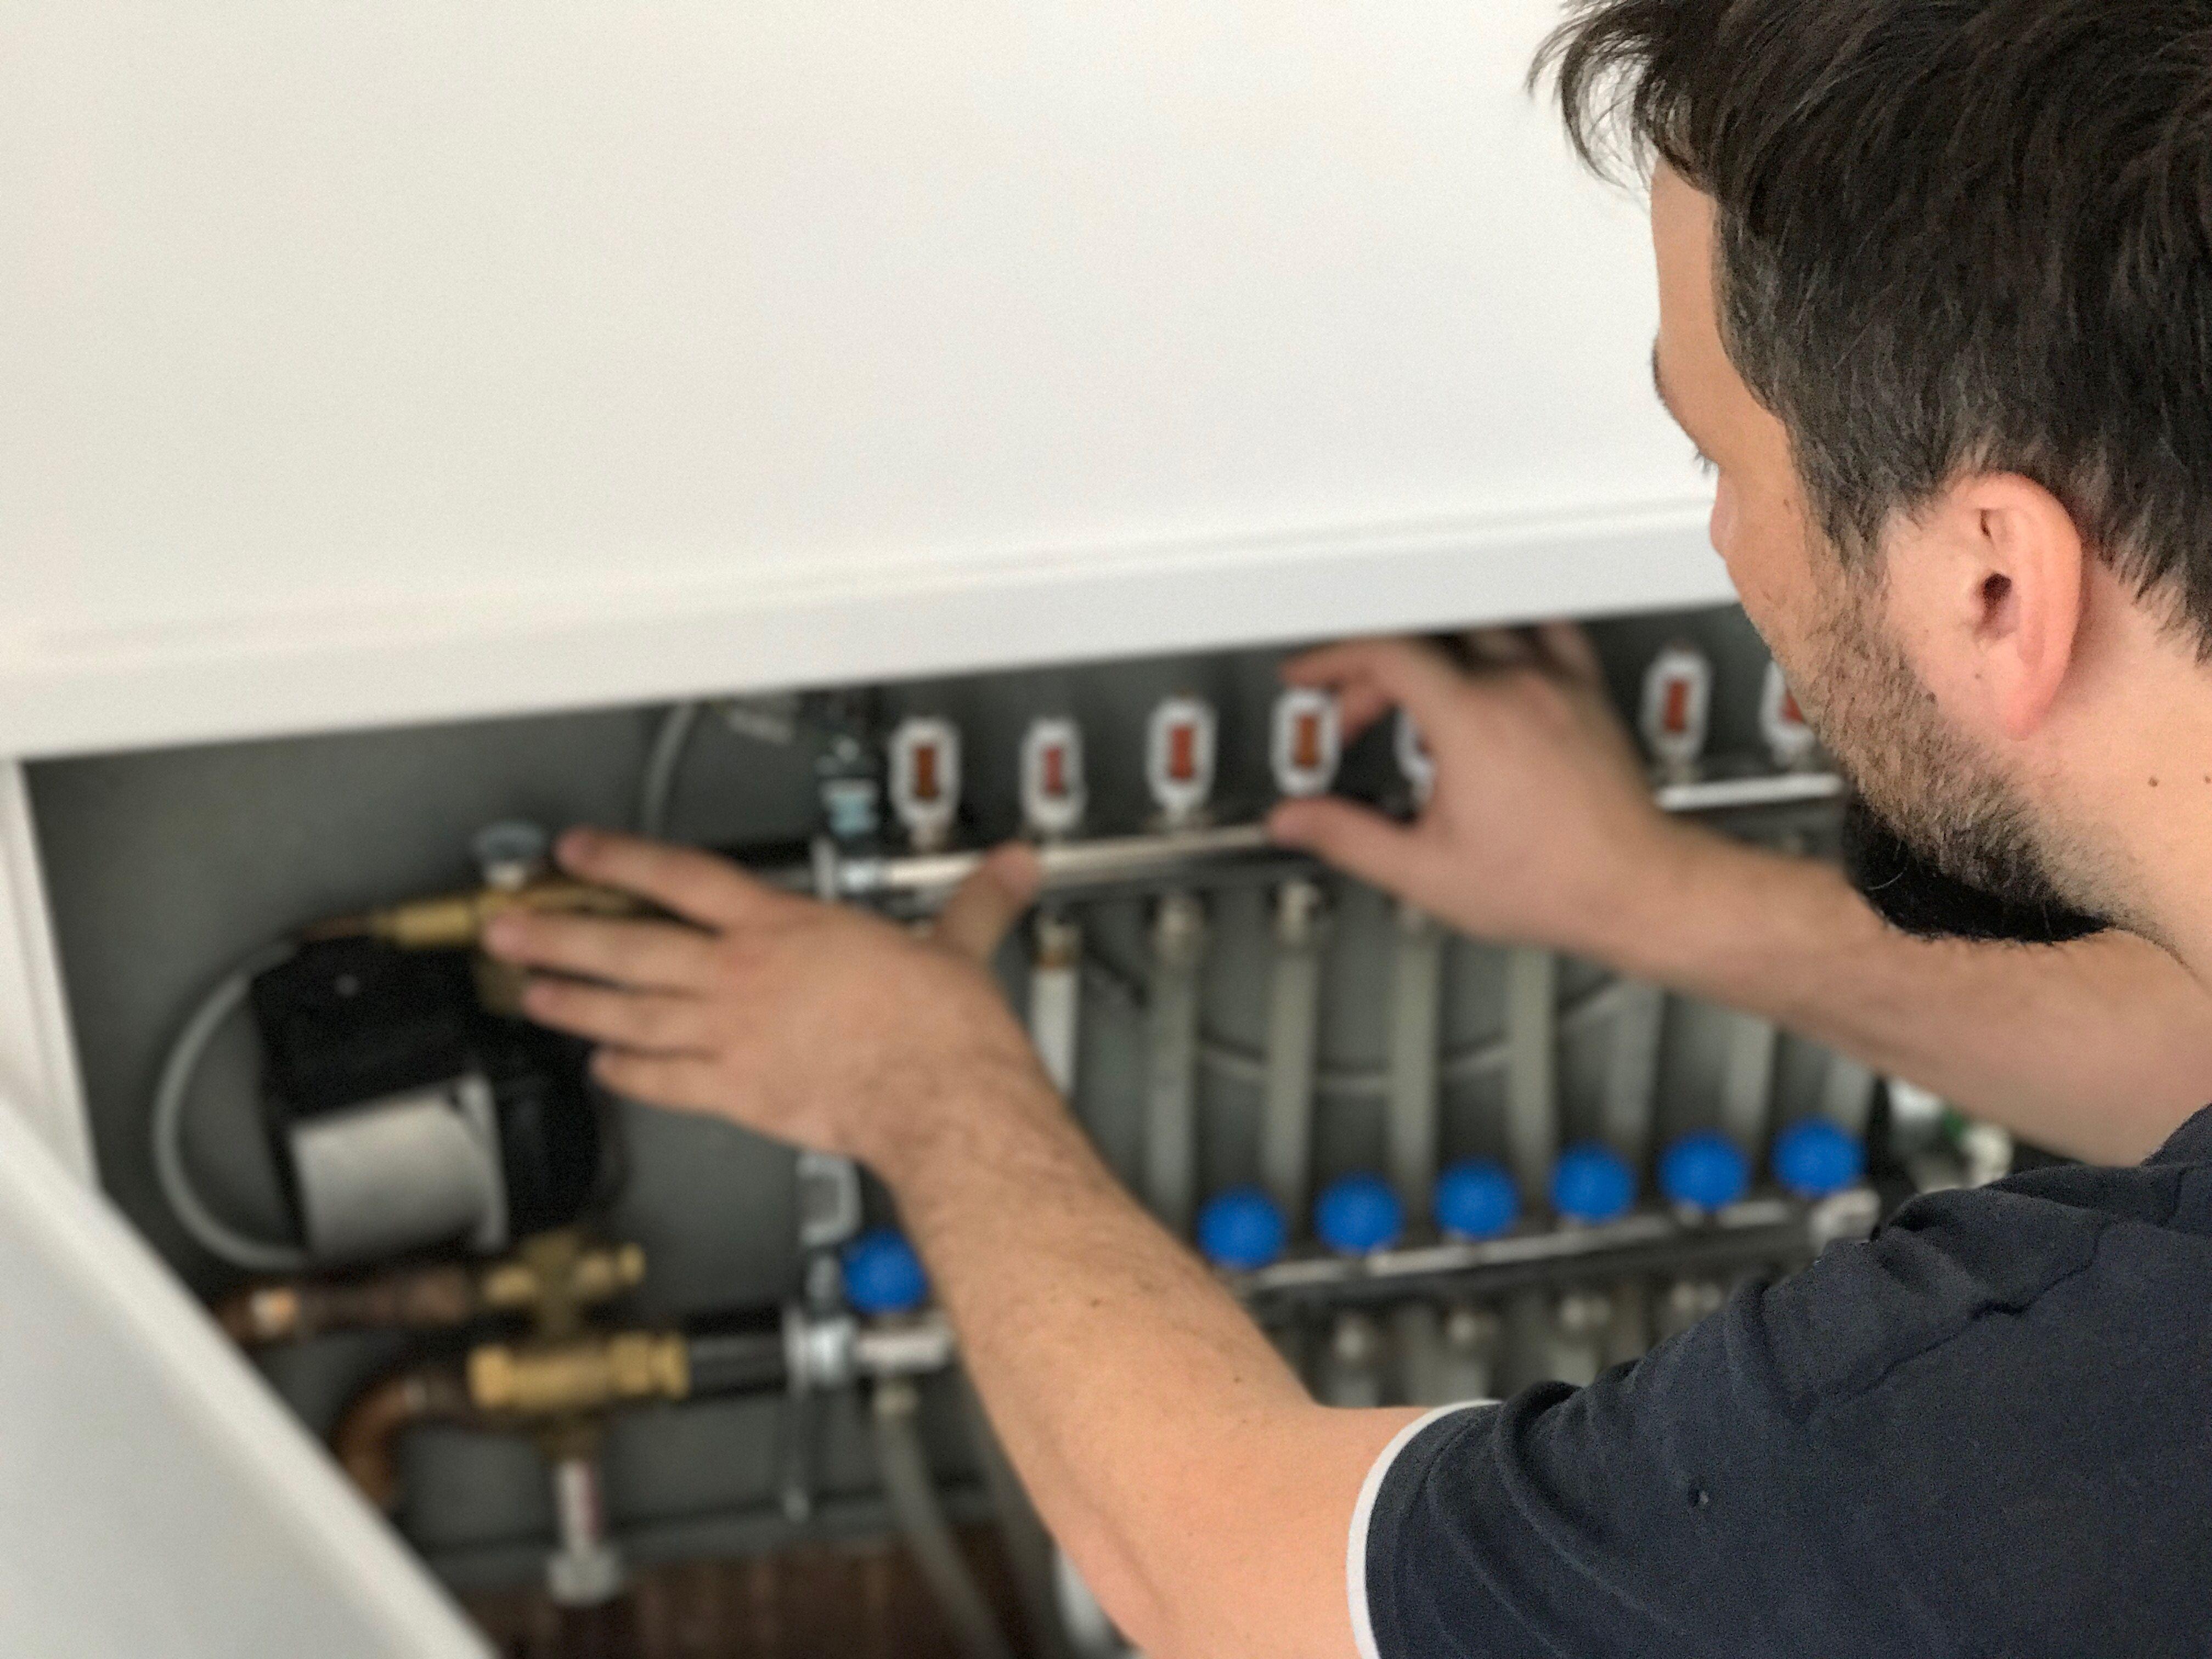 Heat Pump Vs. Electric Heat Efficiency Heat pump, Heat